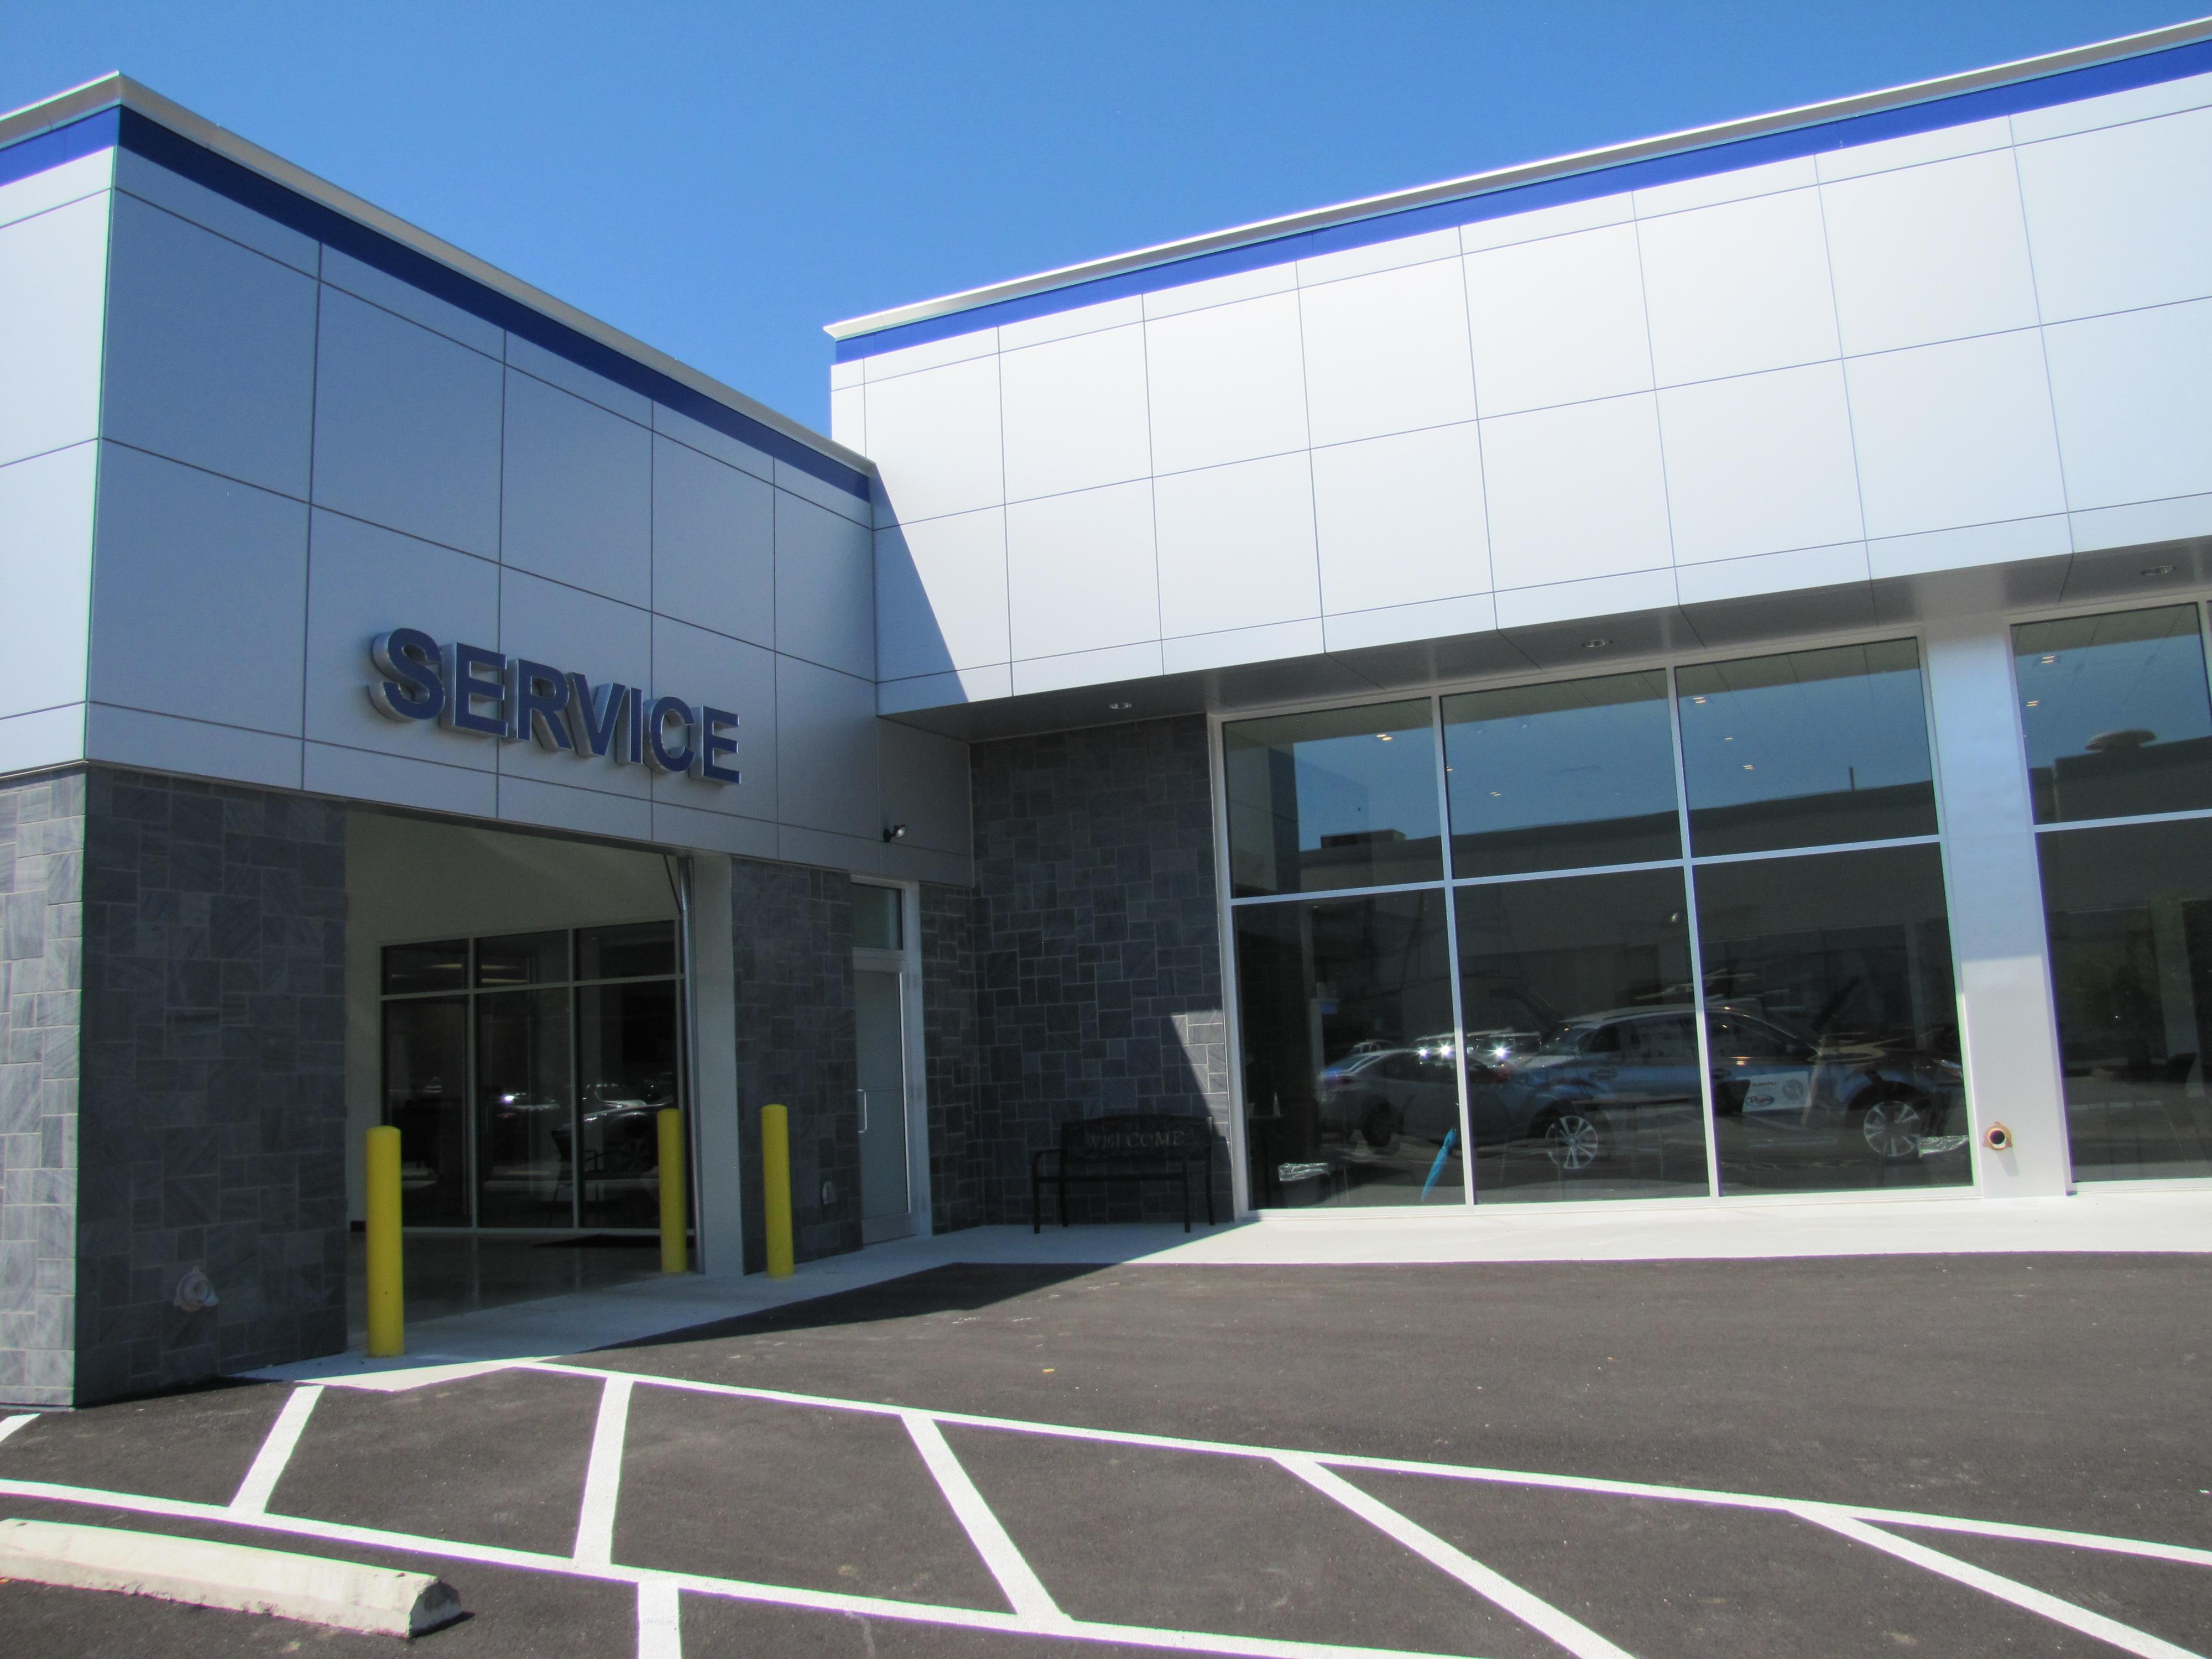 subaru service repair in columbus byers auto service center serving westerville hilliard. Black Bedroom Furniture Sets. Home Design Ideas